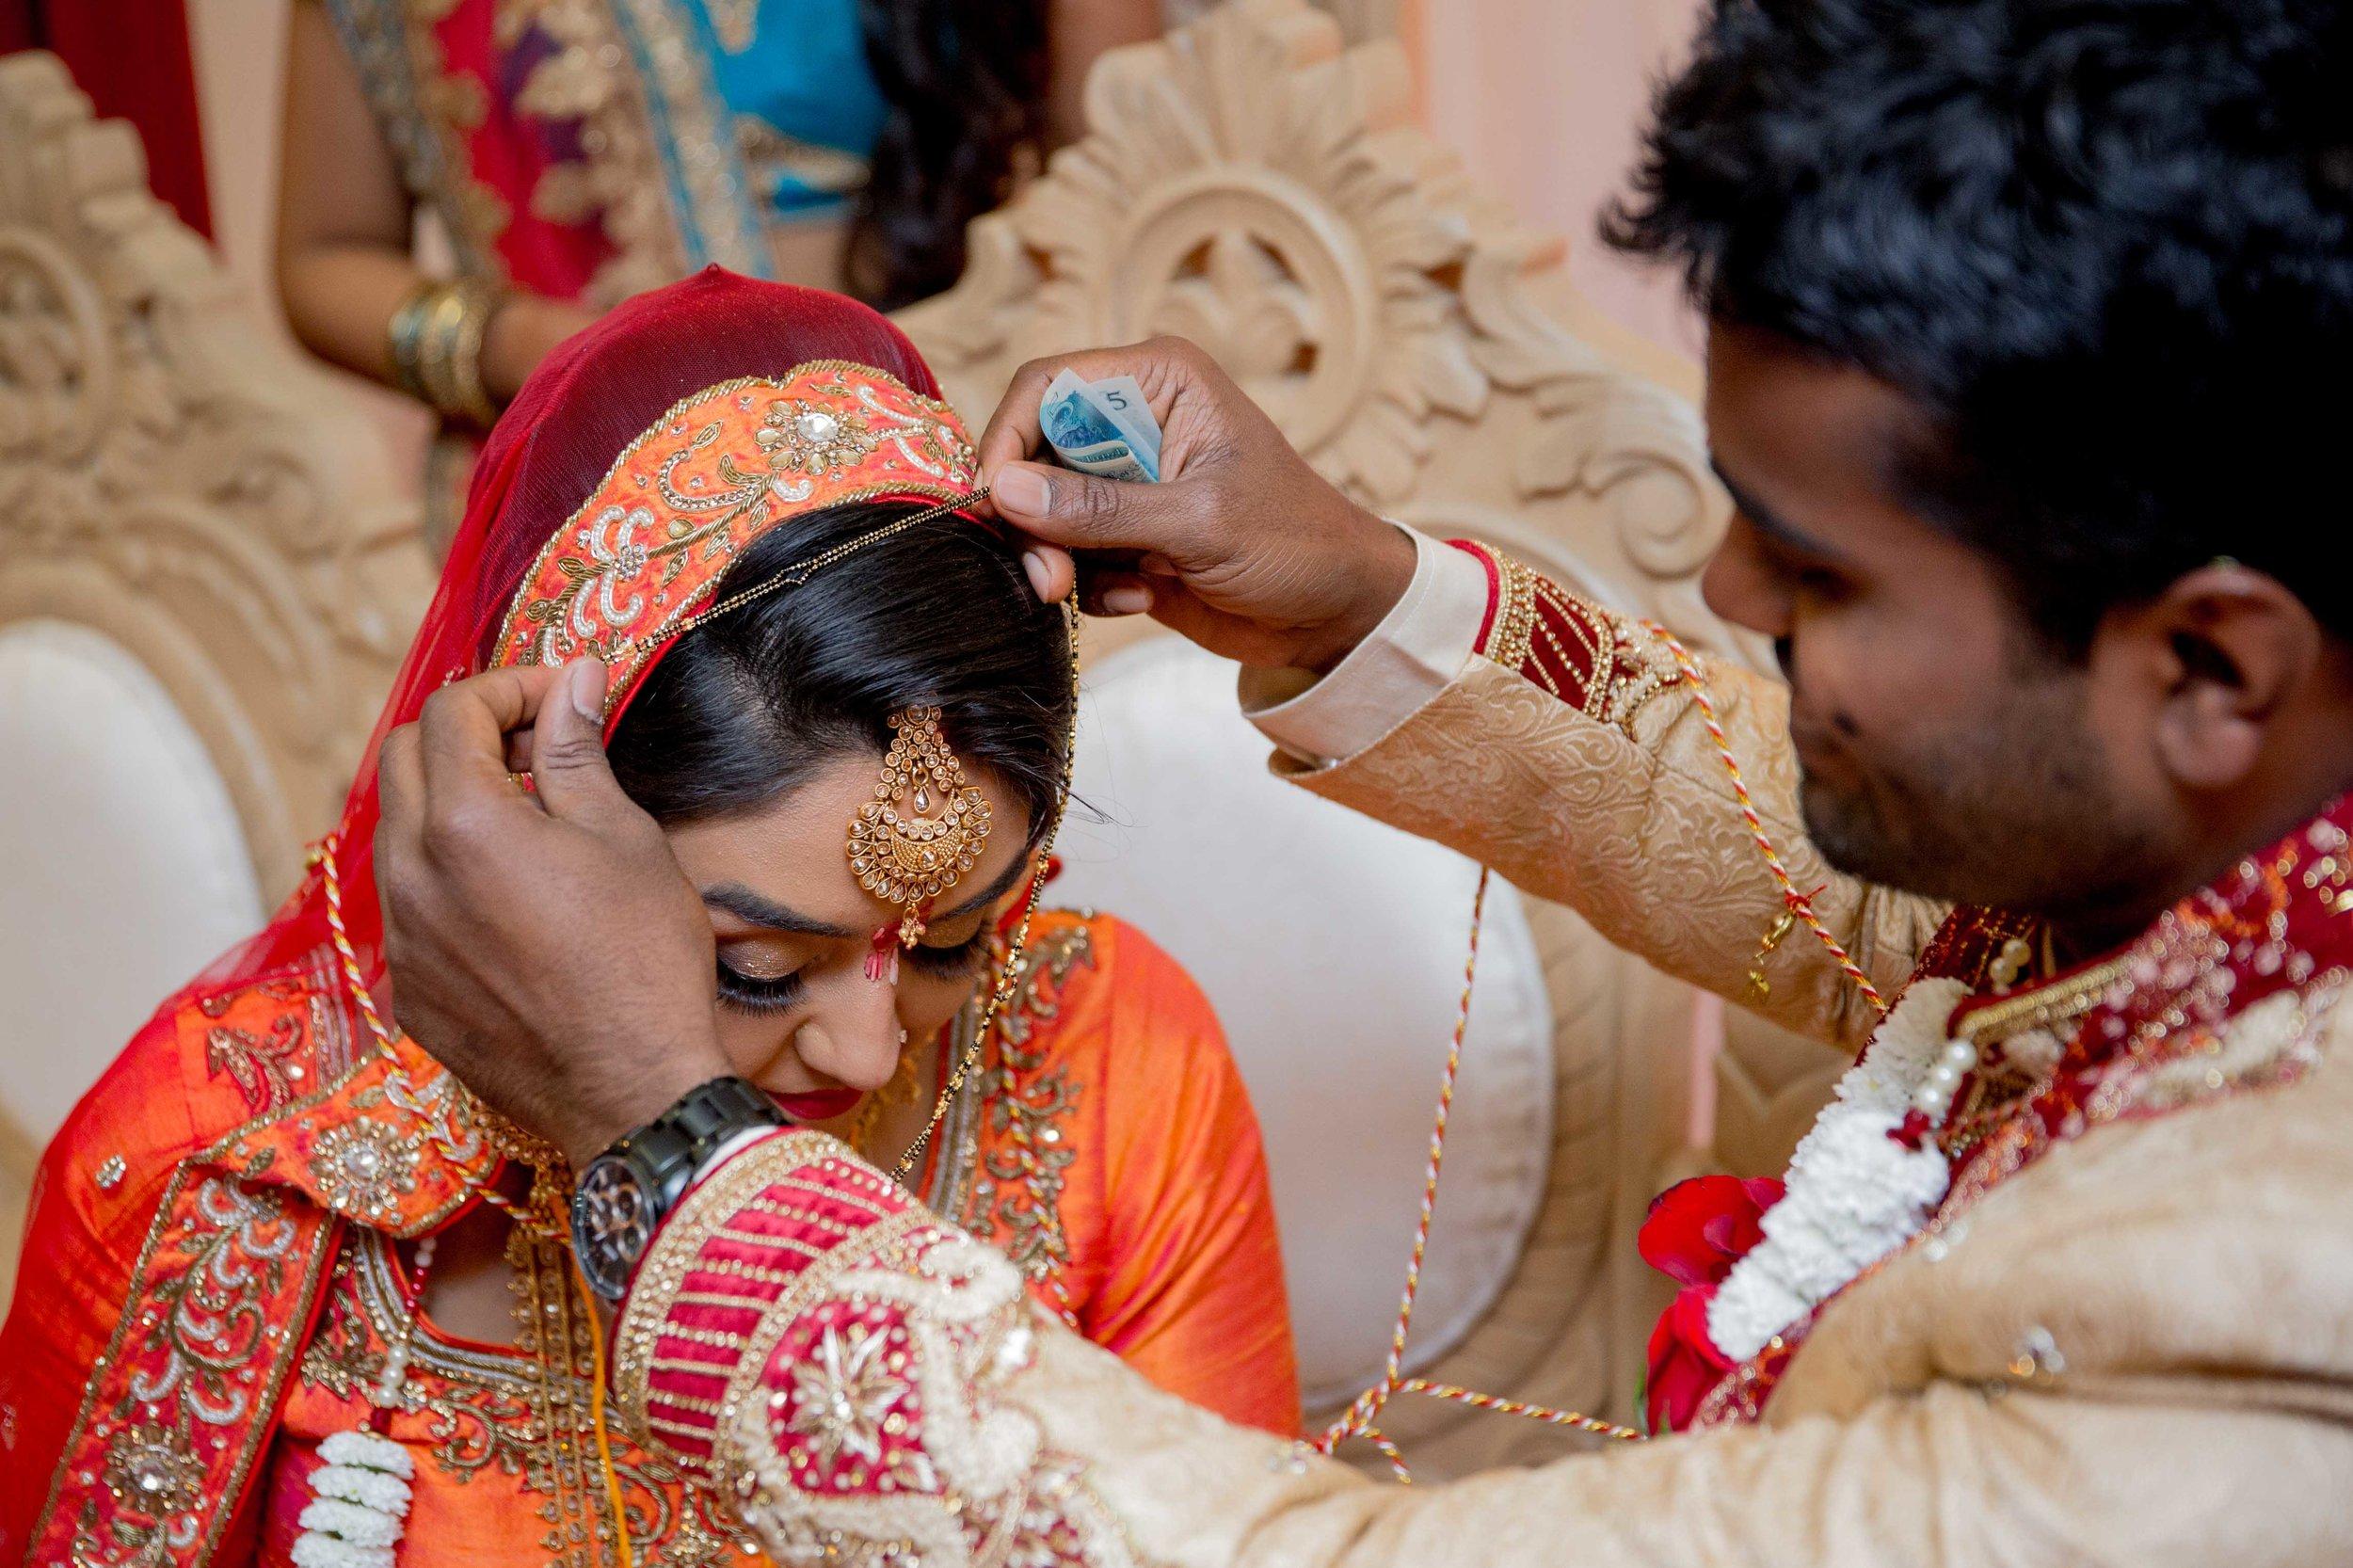 premier-banquetting-london-Hindu-asian-wedding-photographer-natalia-smith-photography-39.jpg